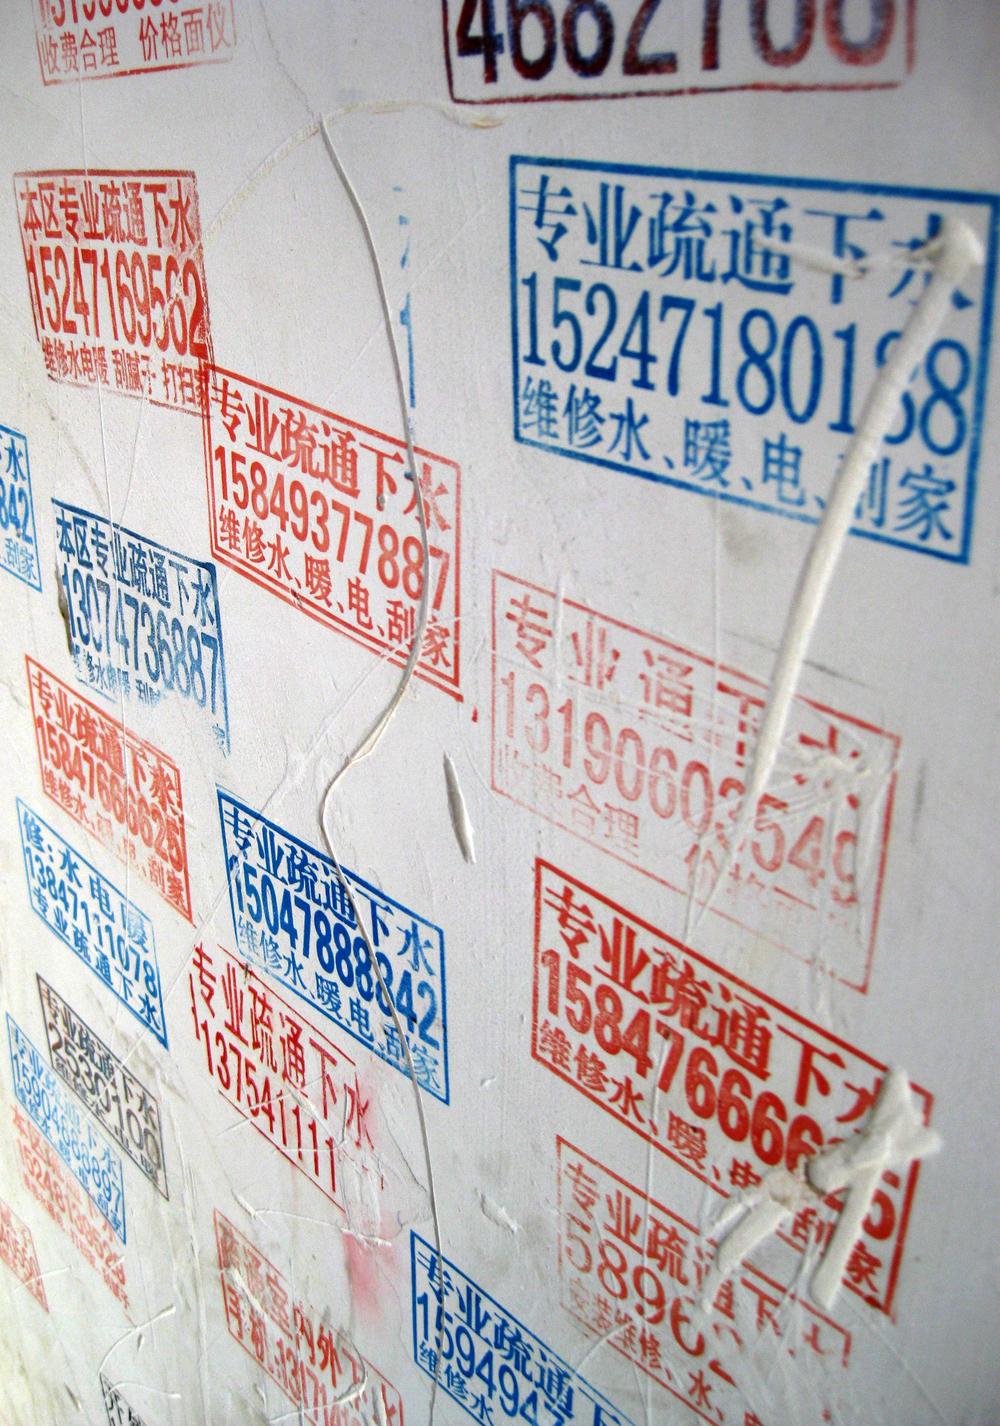 Apartment Building Hallway V1: Hohhot, China